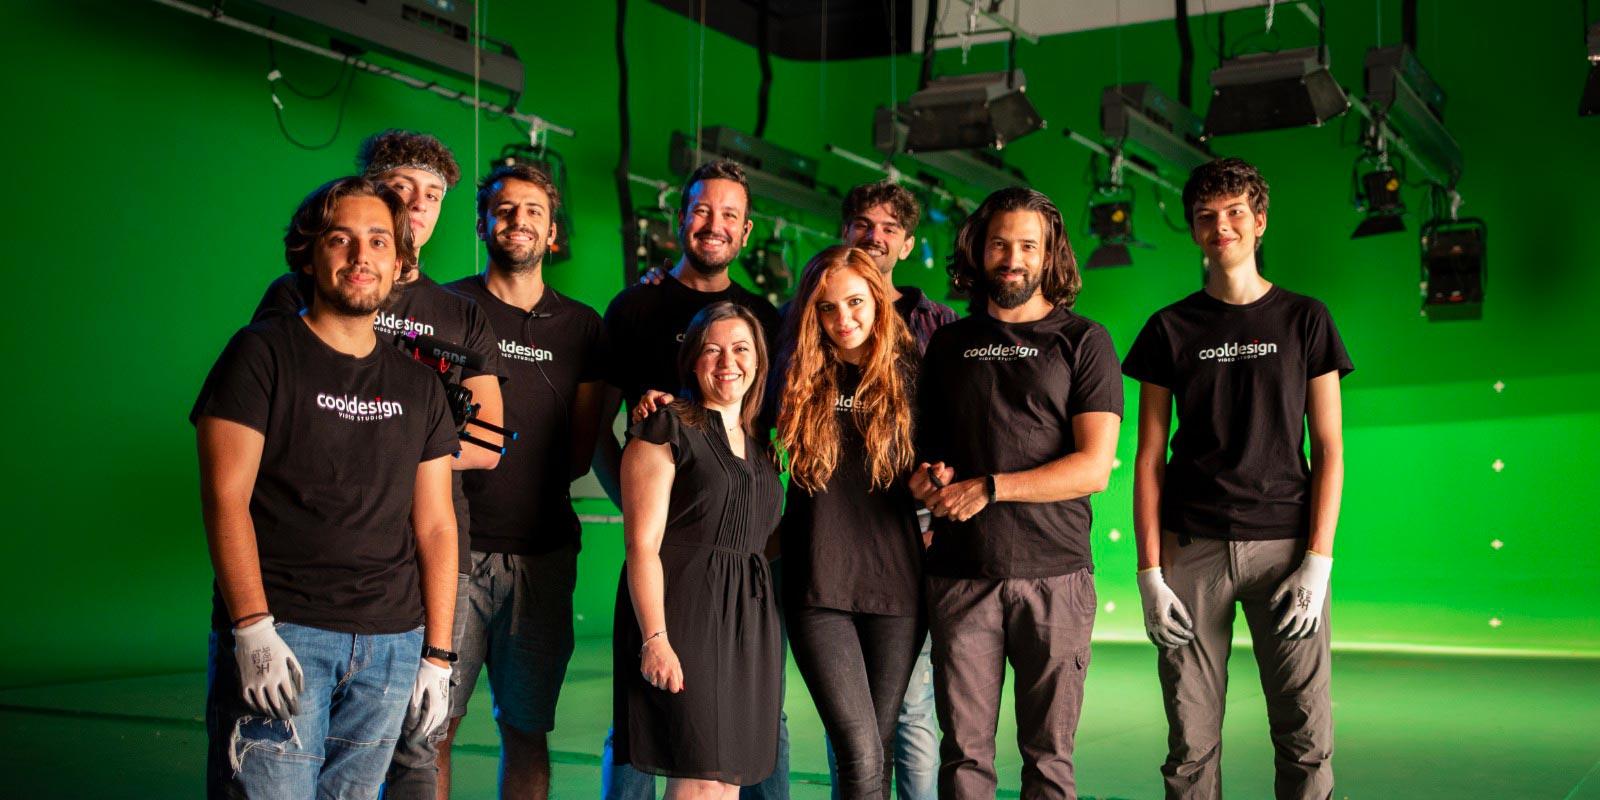 video-studio-people